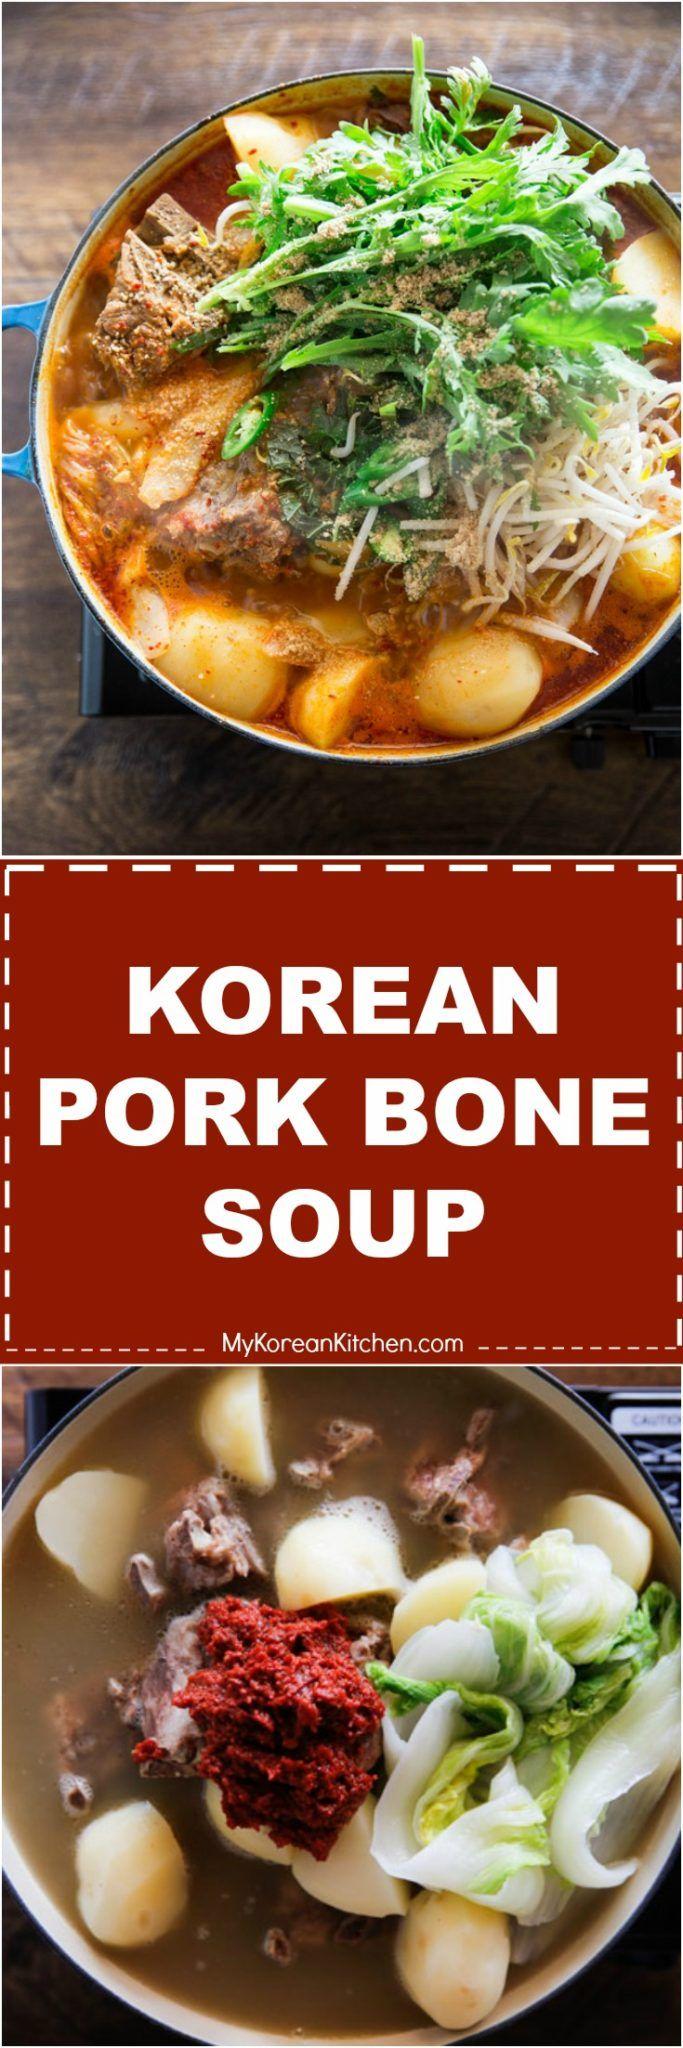 How to Make Gamjatang (Spicy Korean Pork Bone Soup) | MyKoreanKitchen.com #koreanfood #koreansoup #bonebroth via @mykoreankitchen